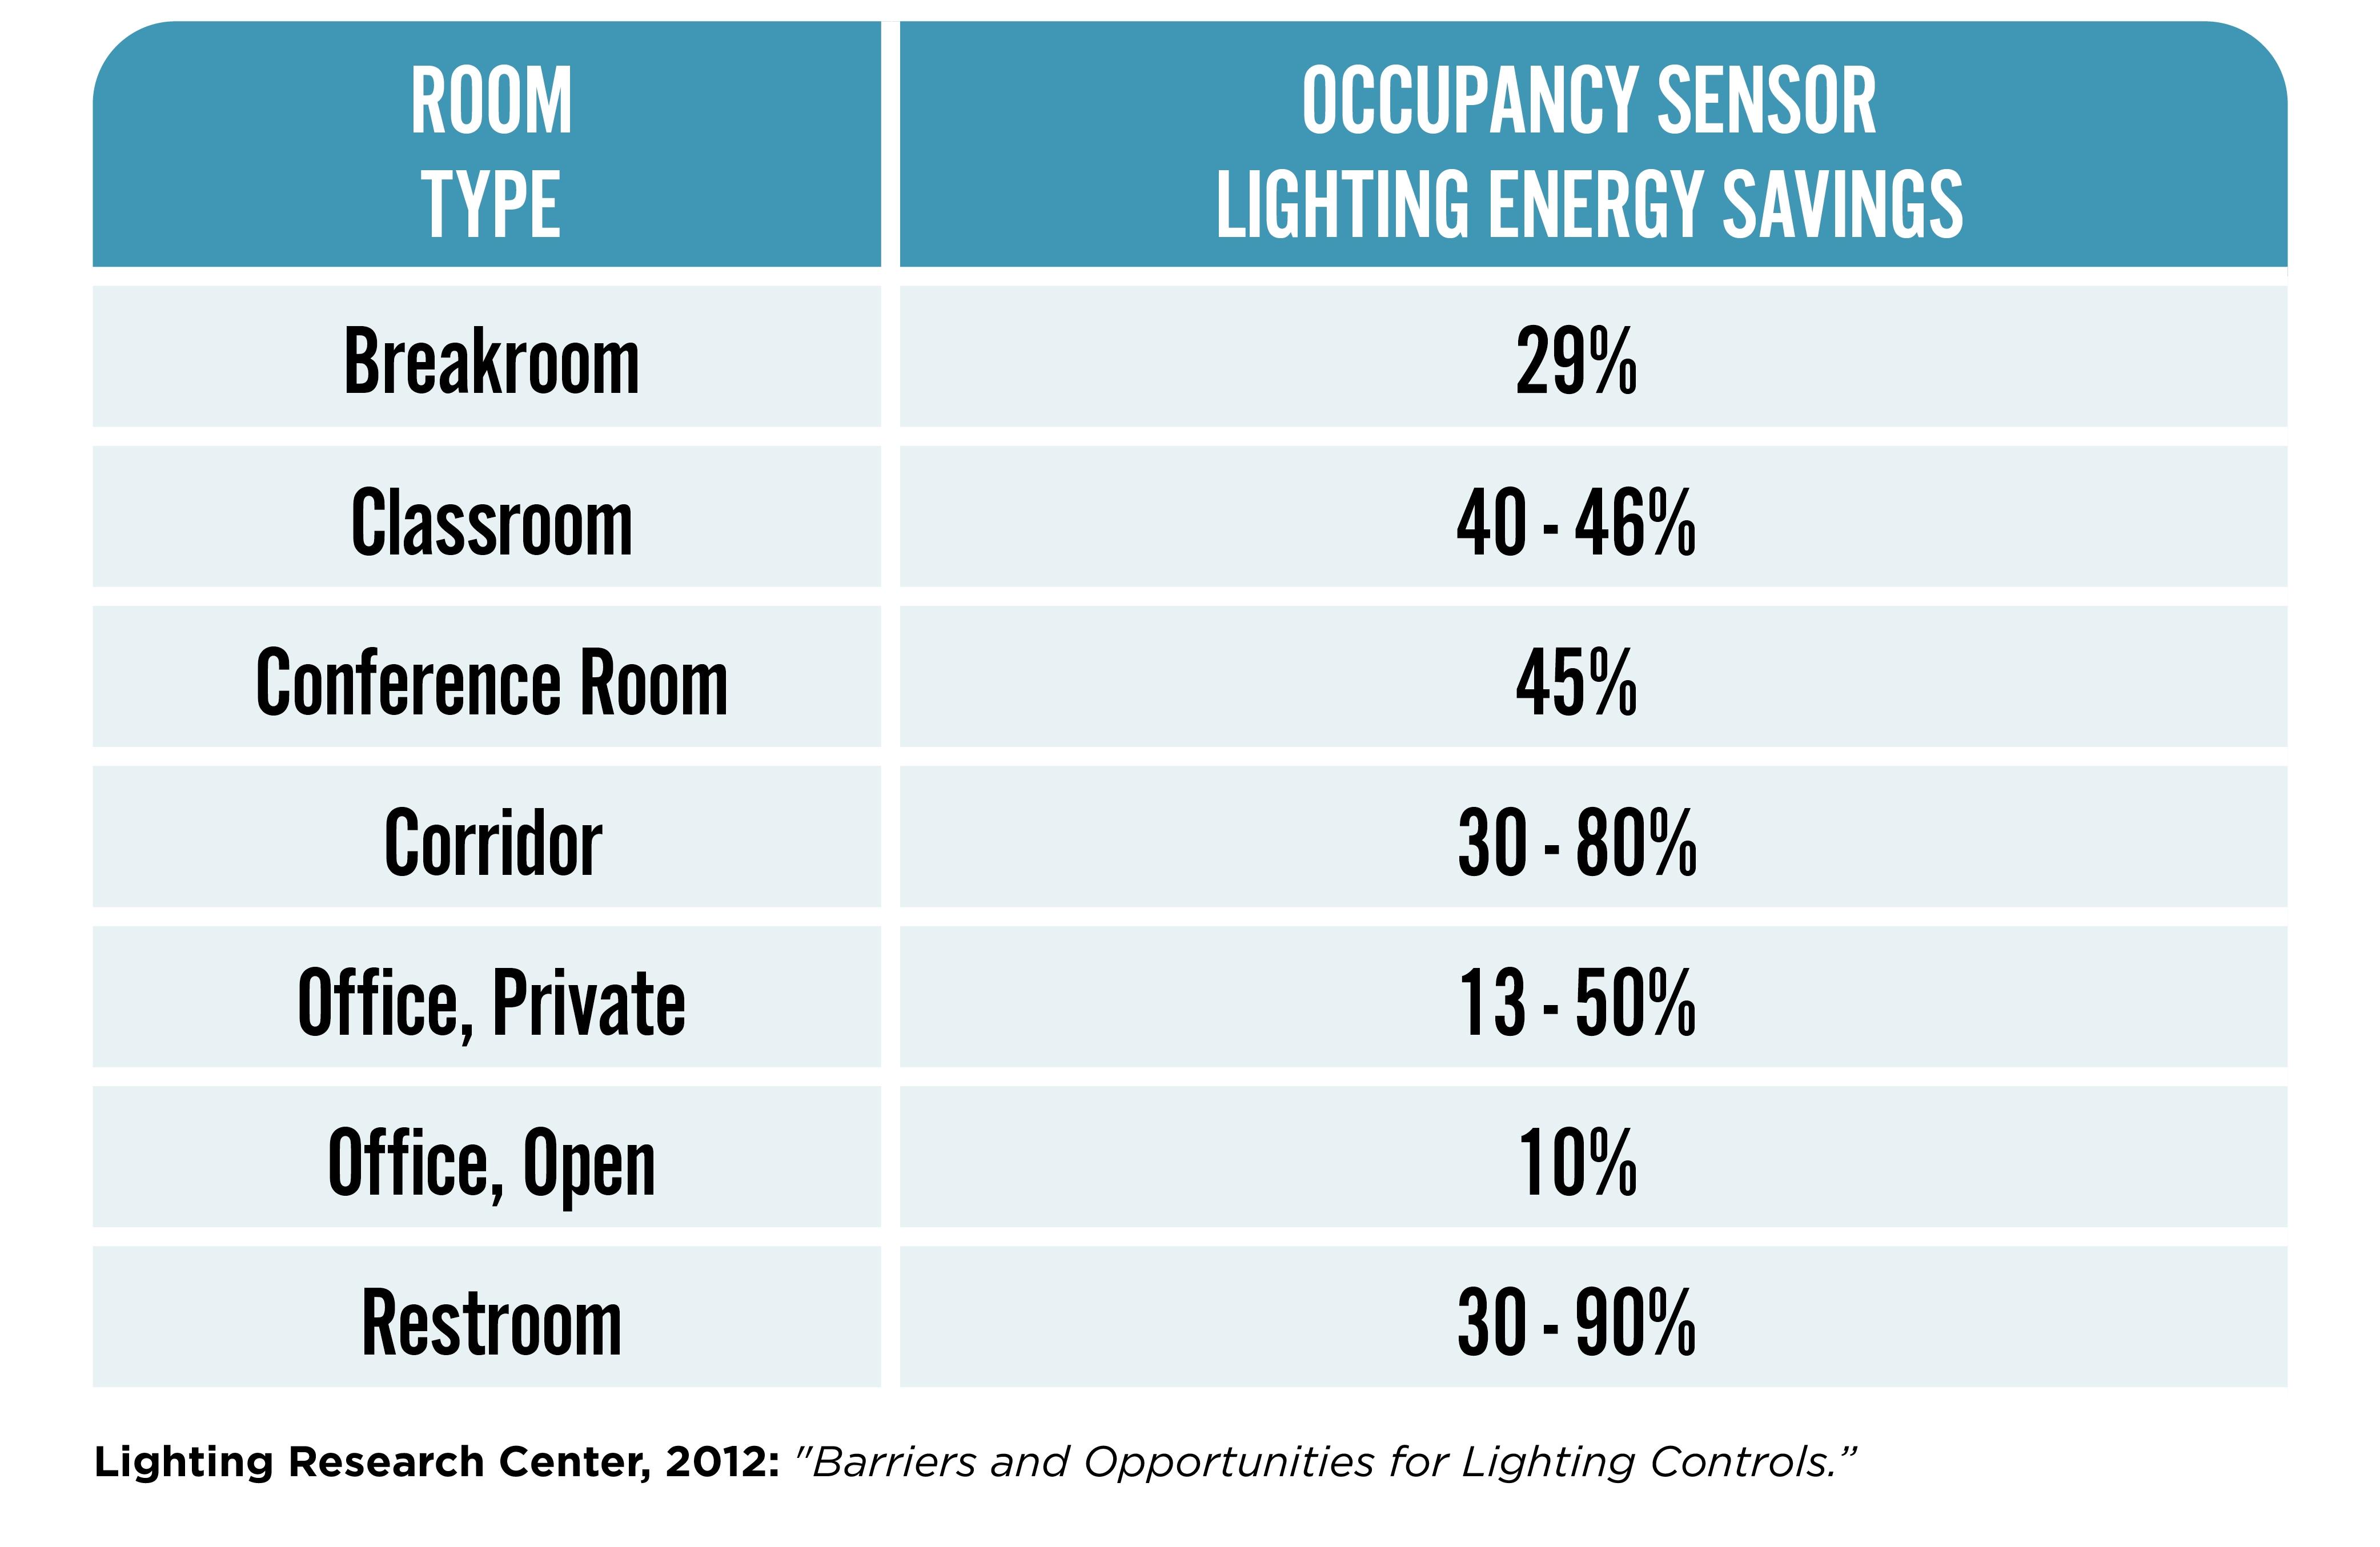 Occupancy Sensor Lighting Energy Savings